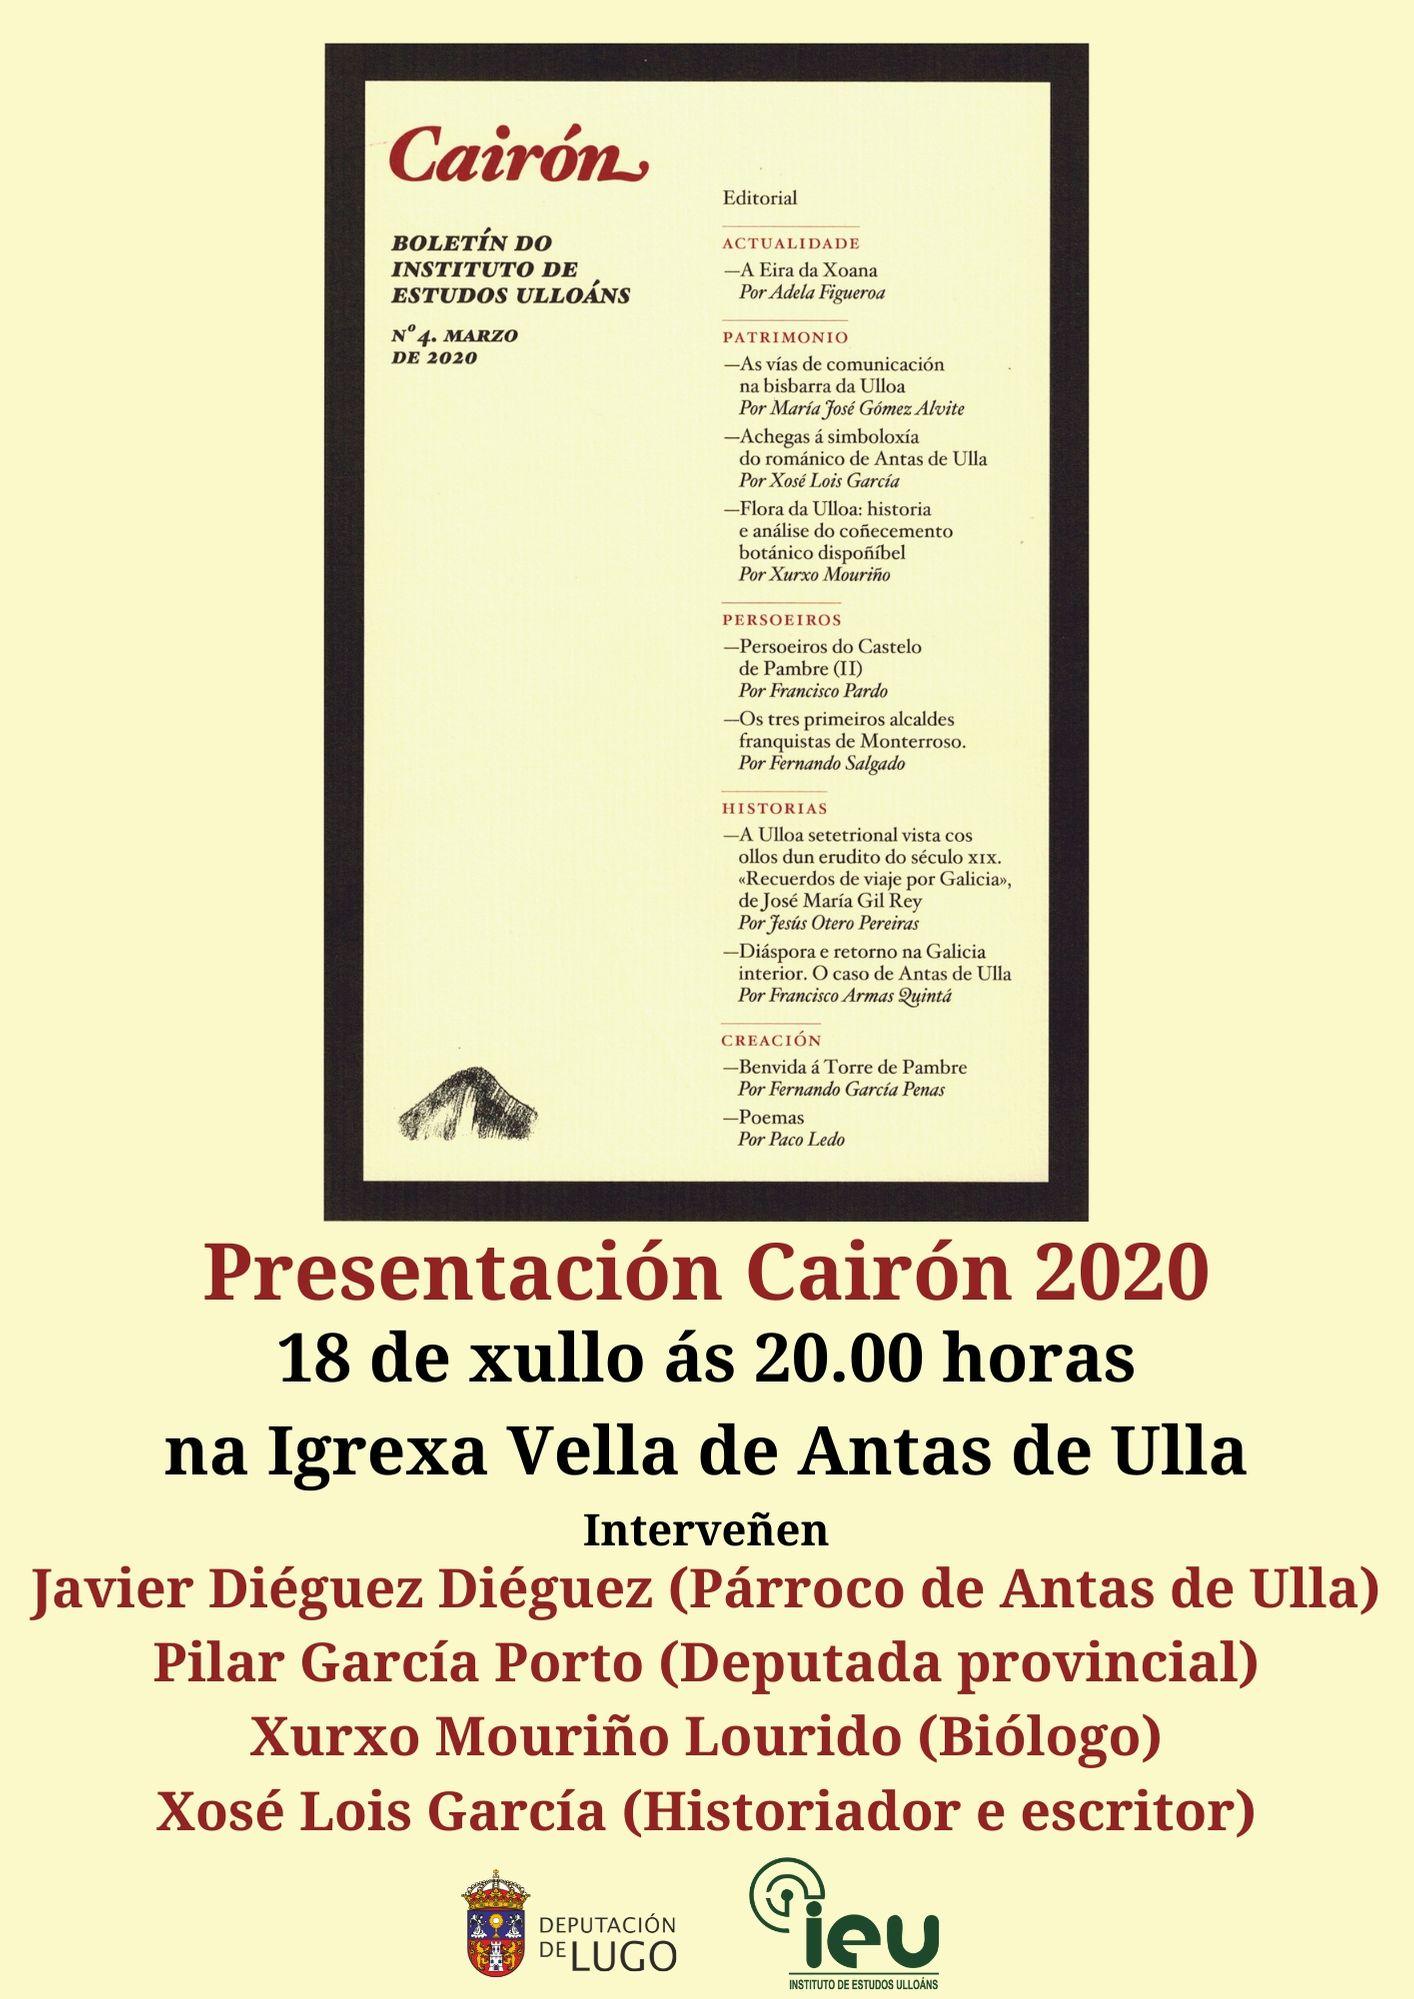 Presentación Cairón 4, Antas de Ulla, Instituto de Esrudos Ulloáns, Deputación de Lugo